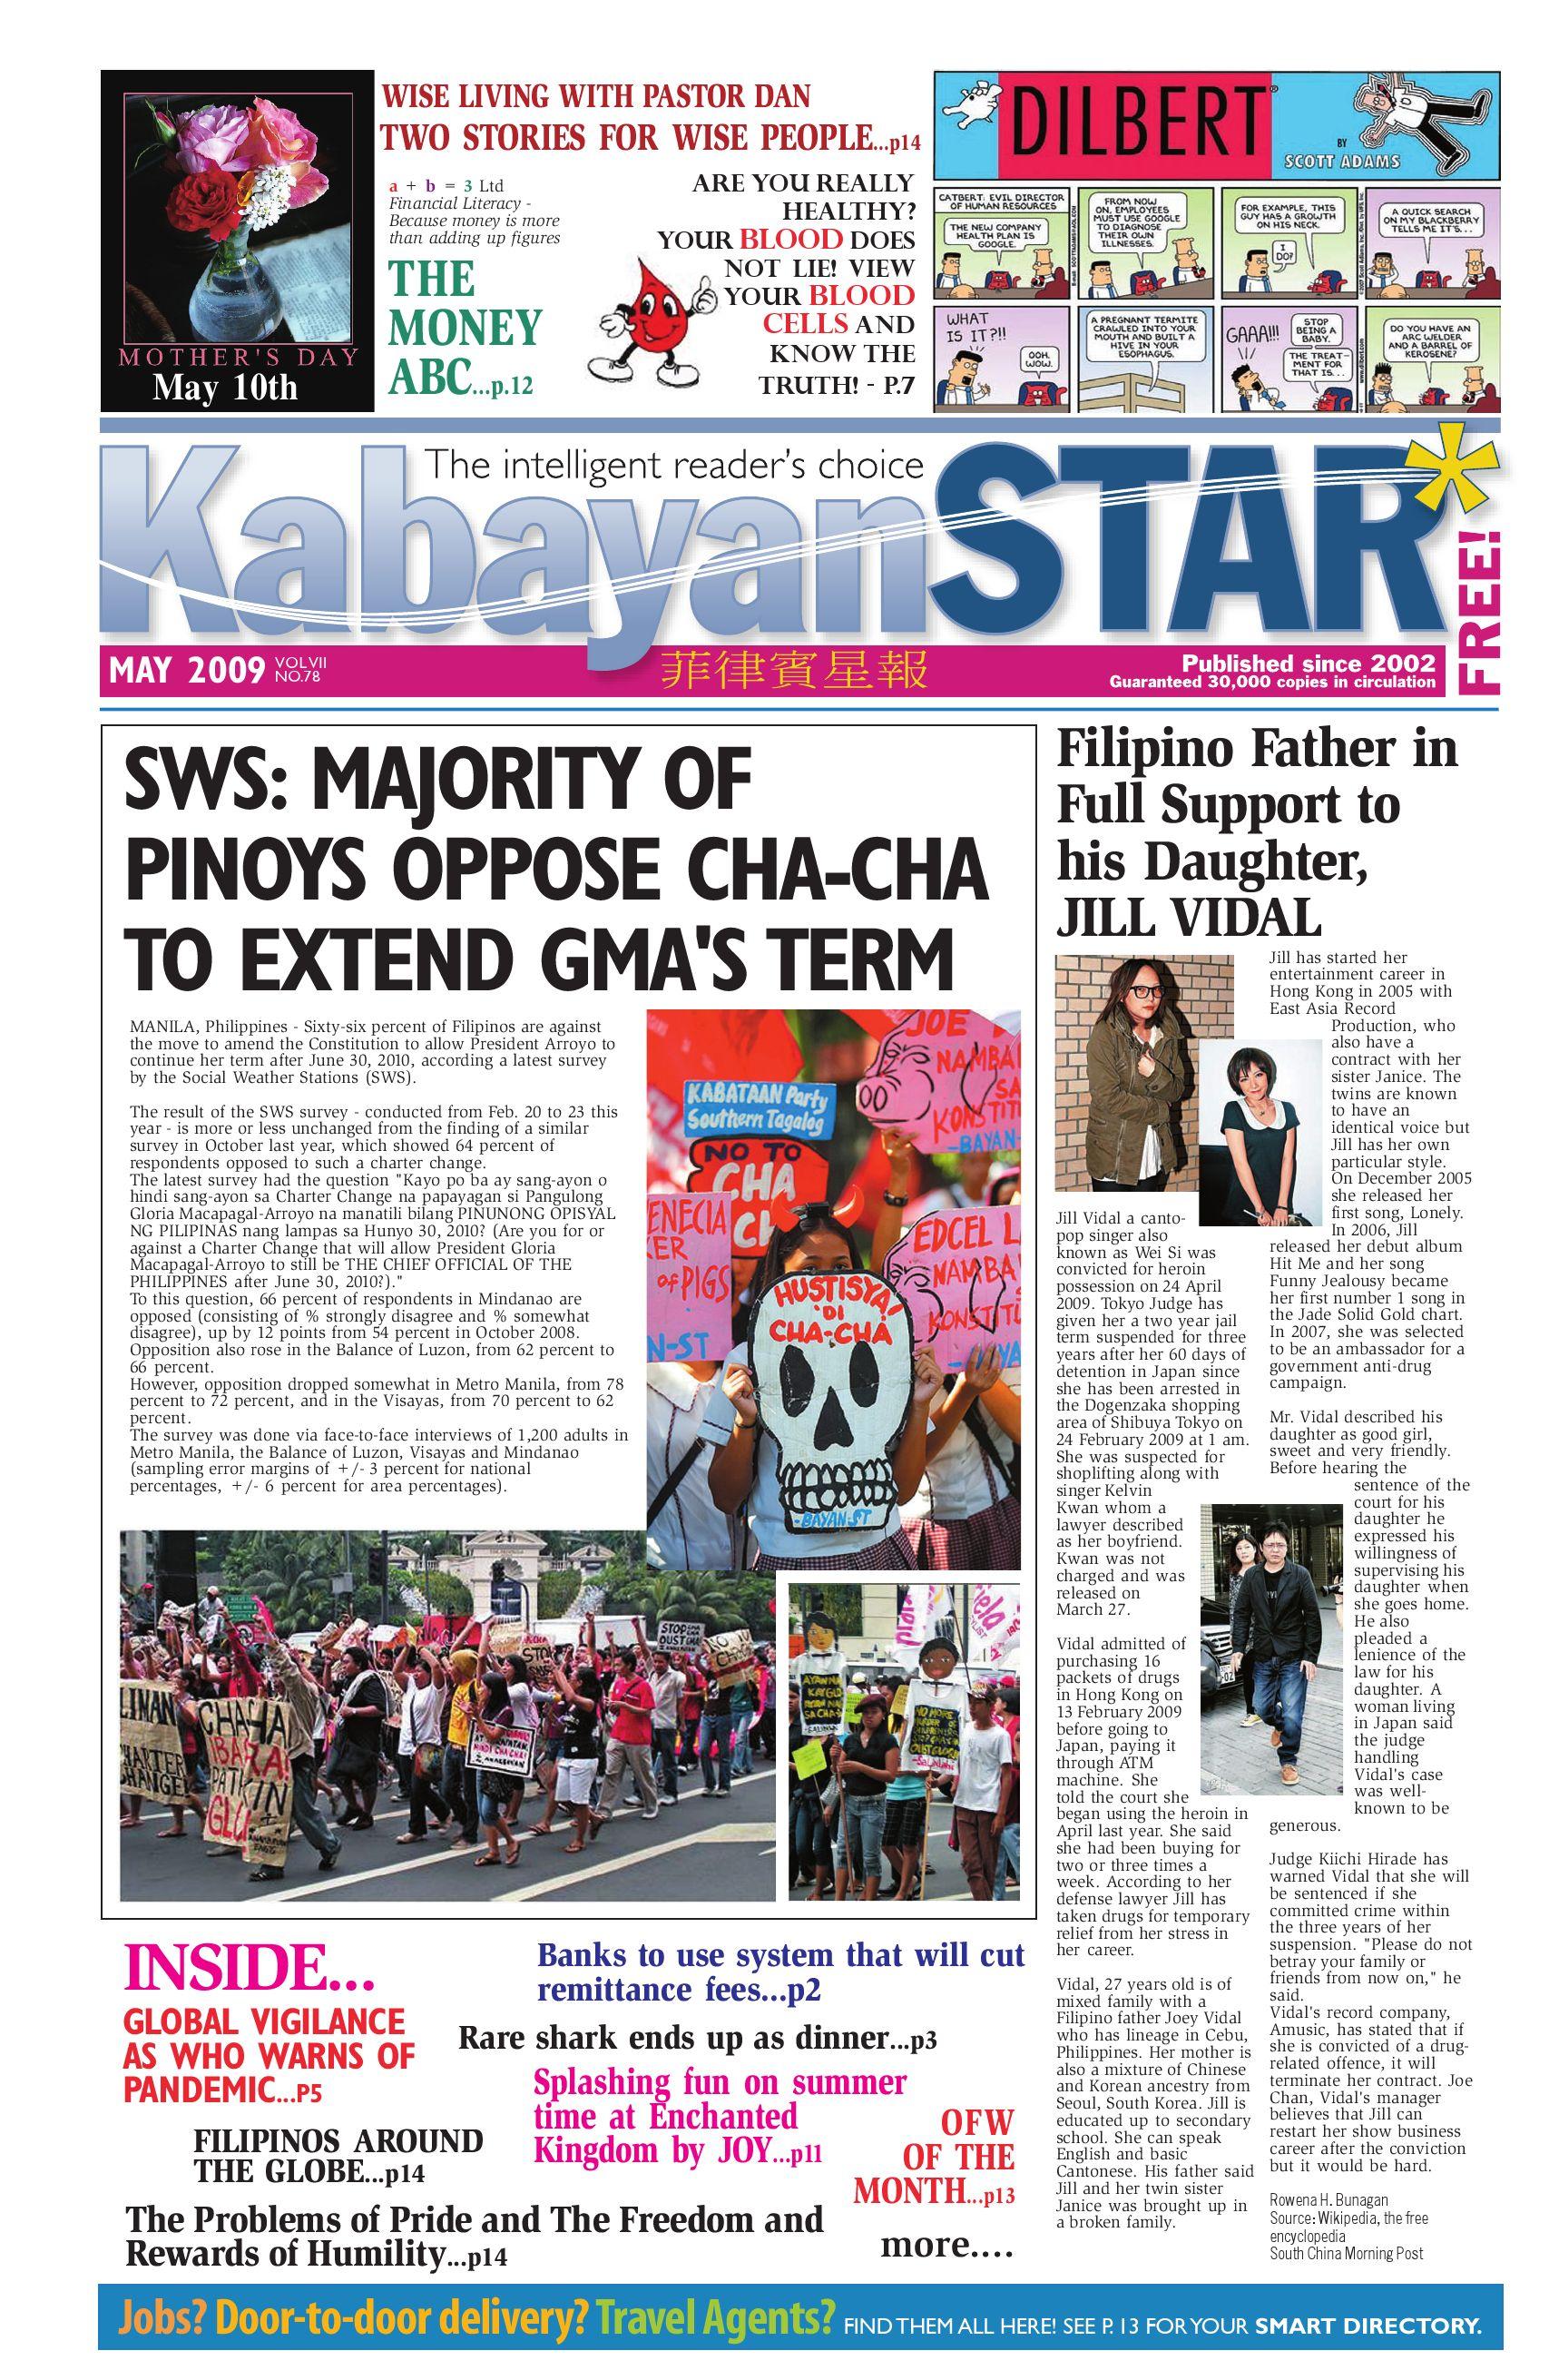 KabayanSTAR#78 May 09 by KabayanSTAR newspaper - issuu